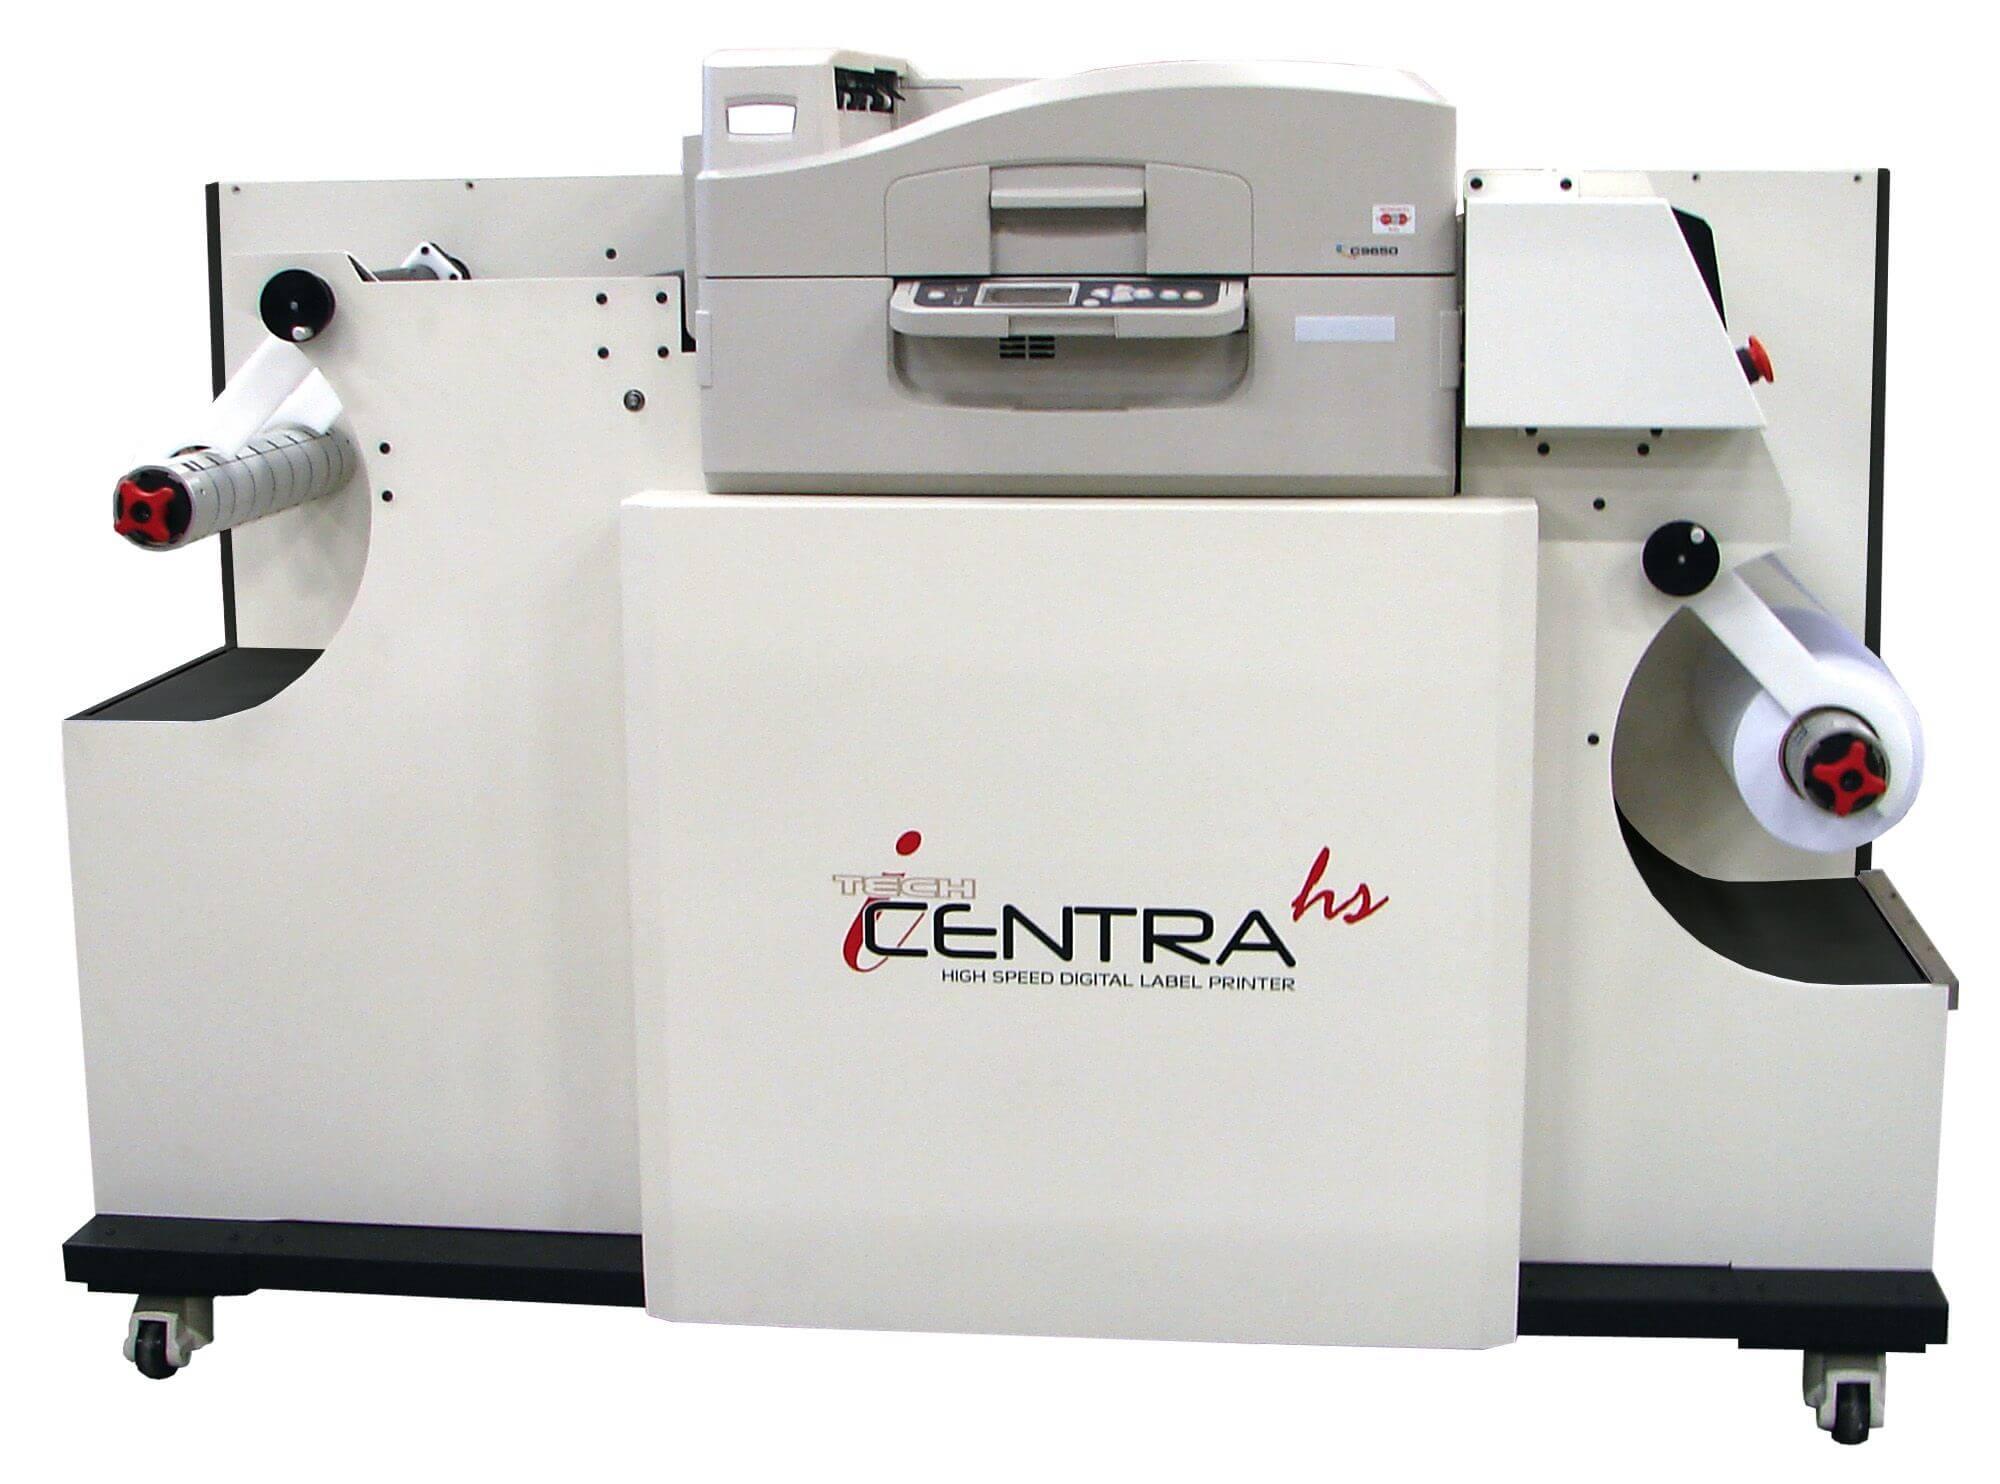 NTG-Centra-Printer